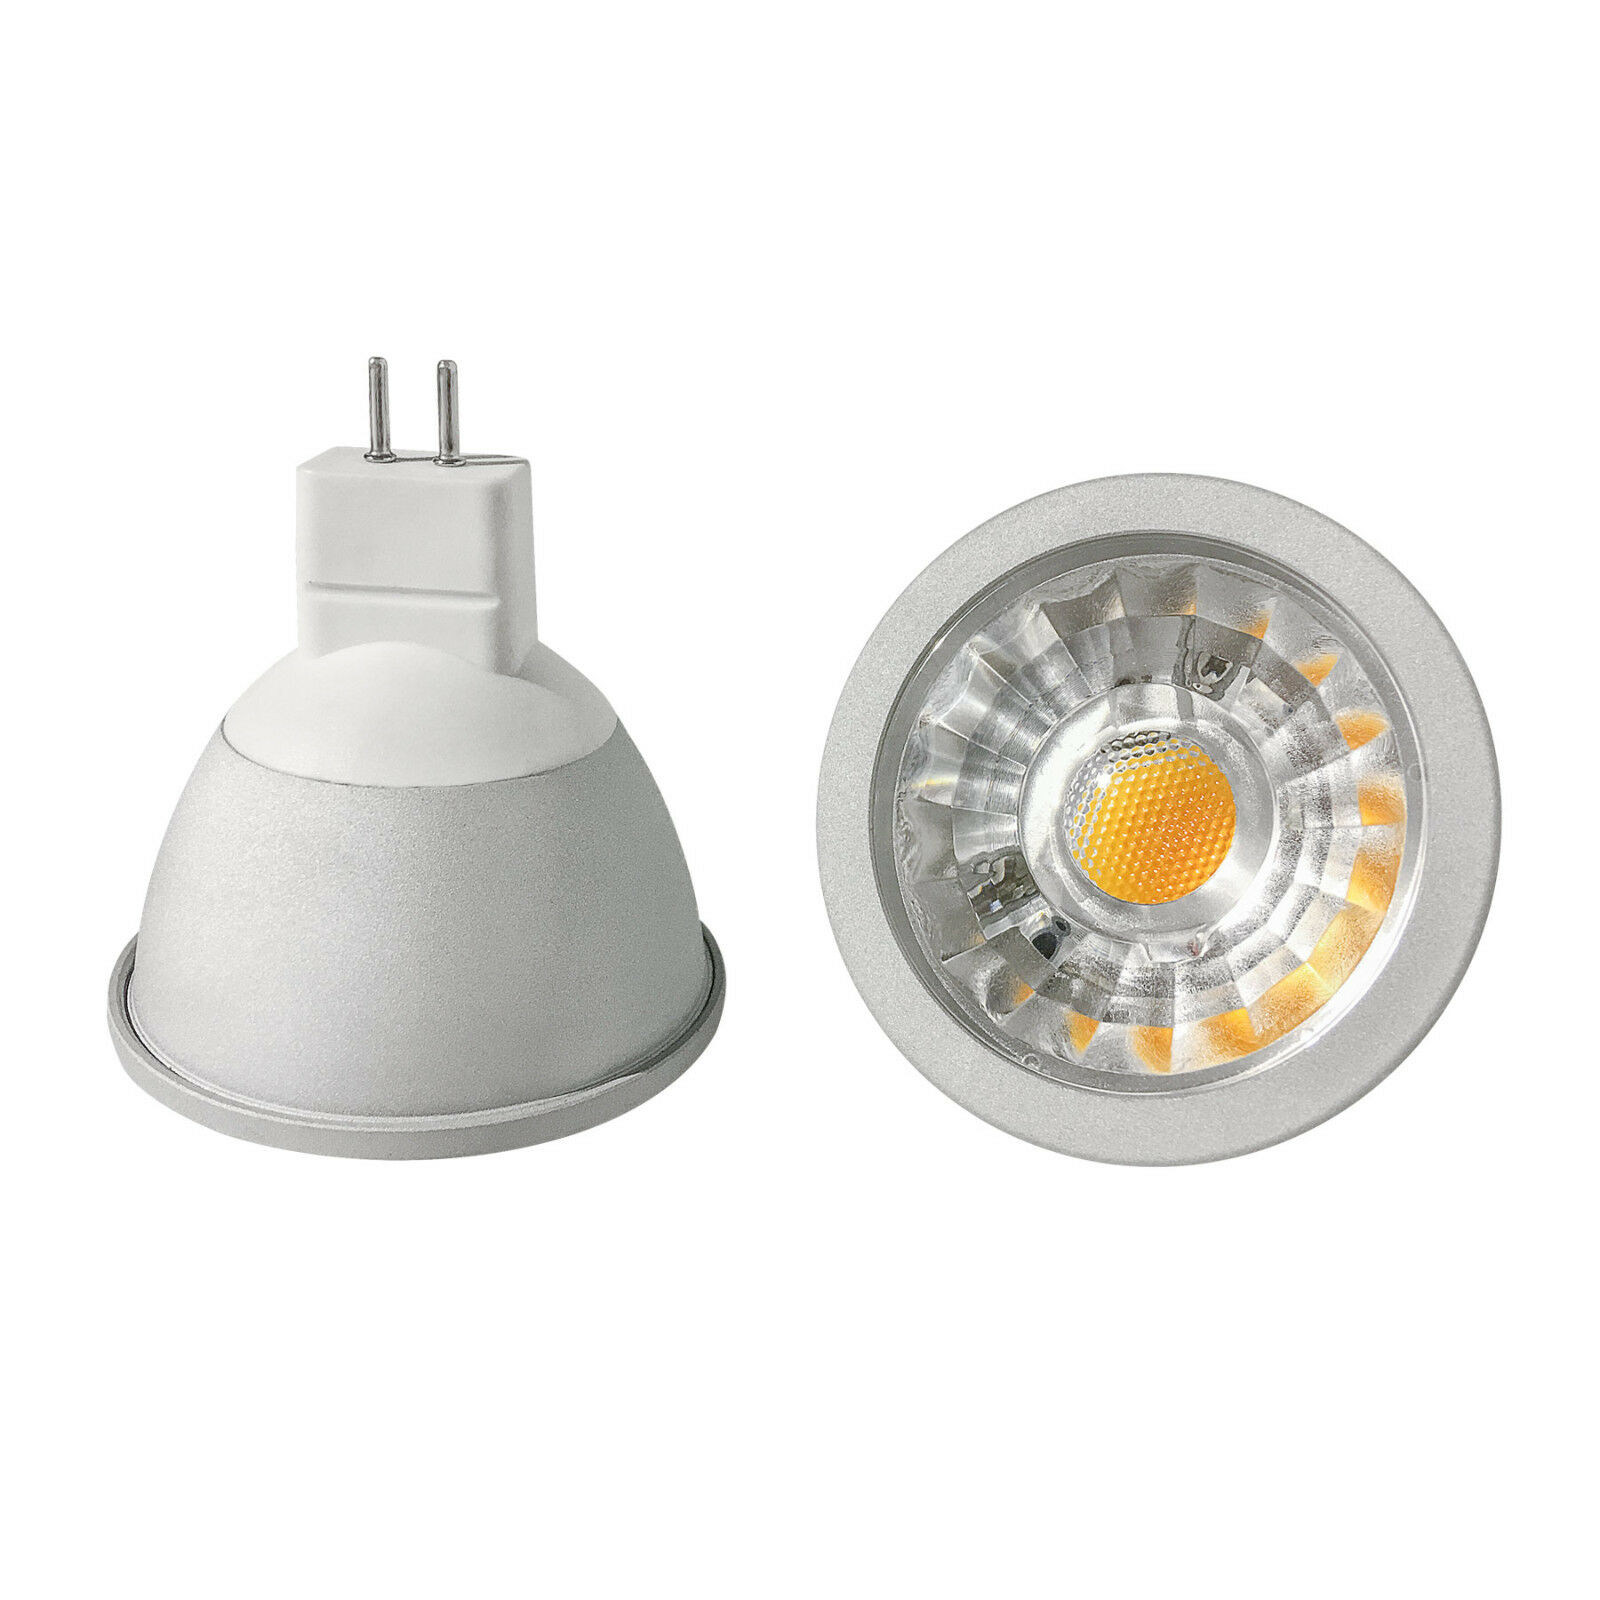 COB LED Leuchtmittel MR16 Gu5.3 - 3 5 6 Watt 280 450 540 Lumen 12 Volt